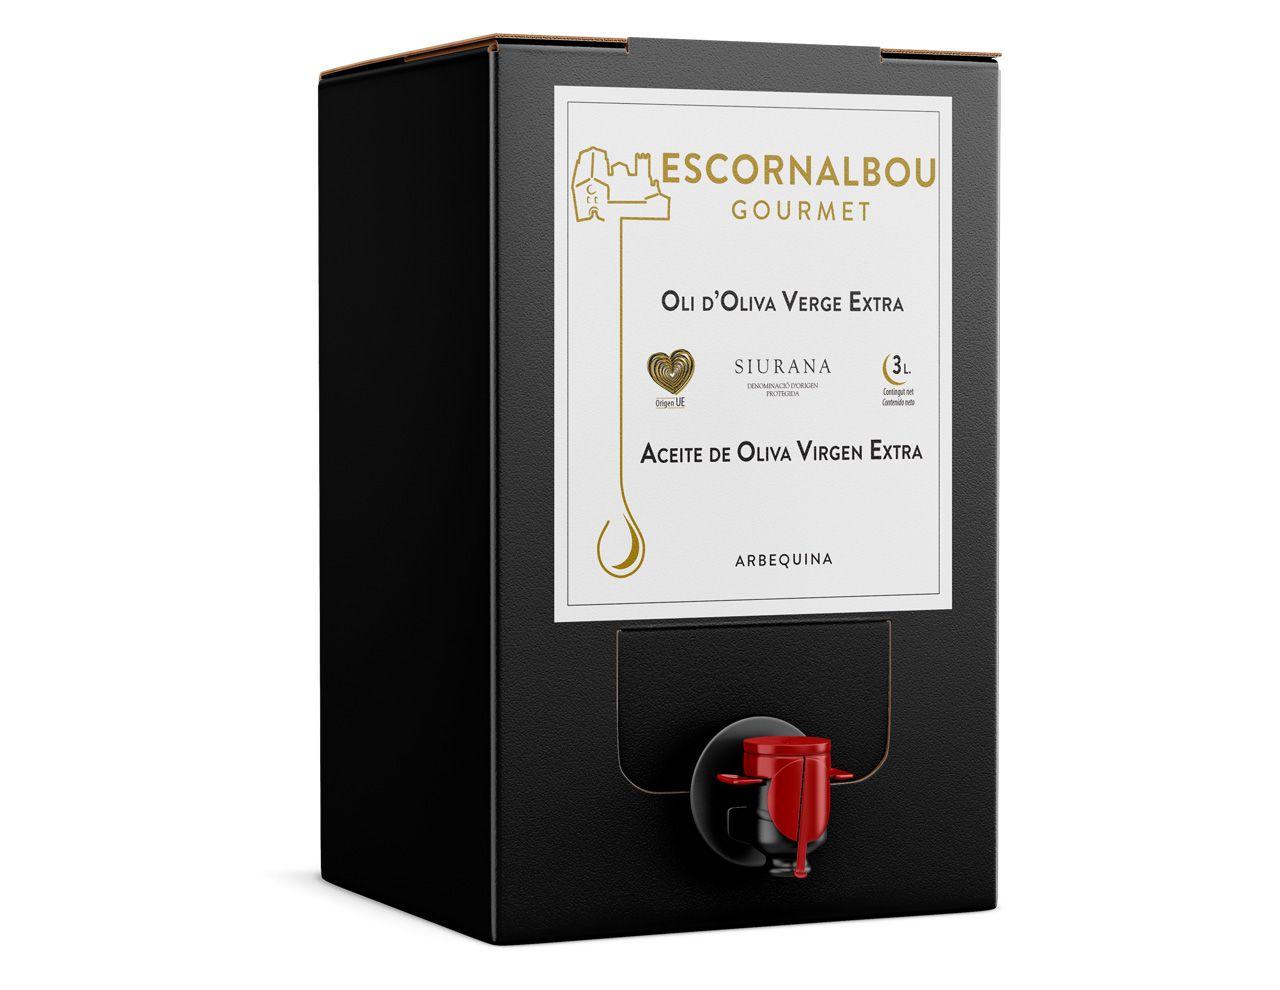 3L Aceite De Oliva Virgen Extra Escornalbou Gourmet – Bag In Box